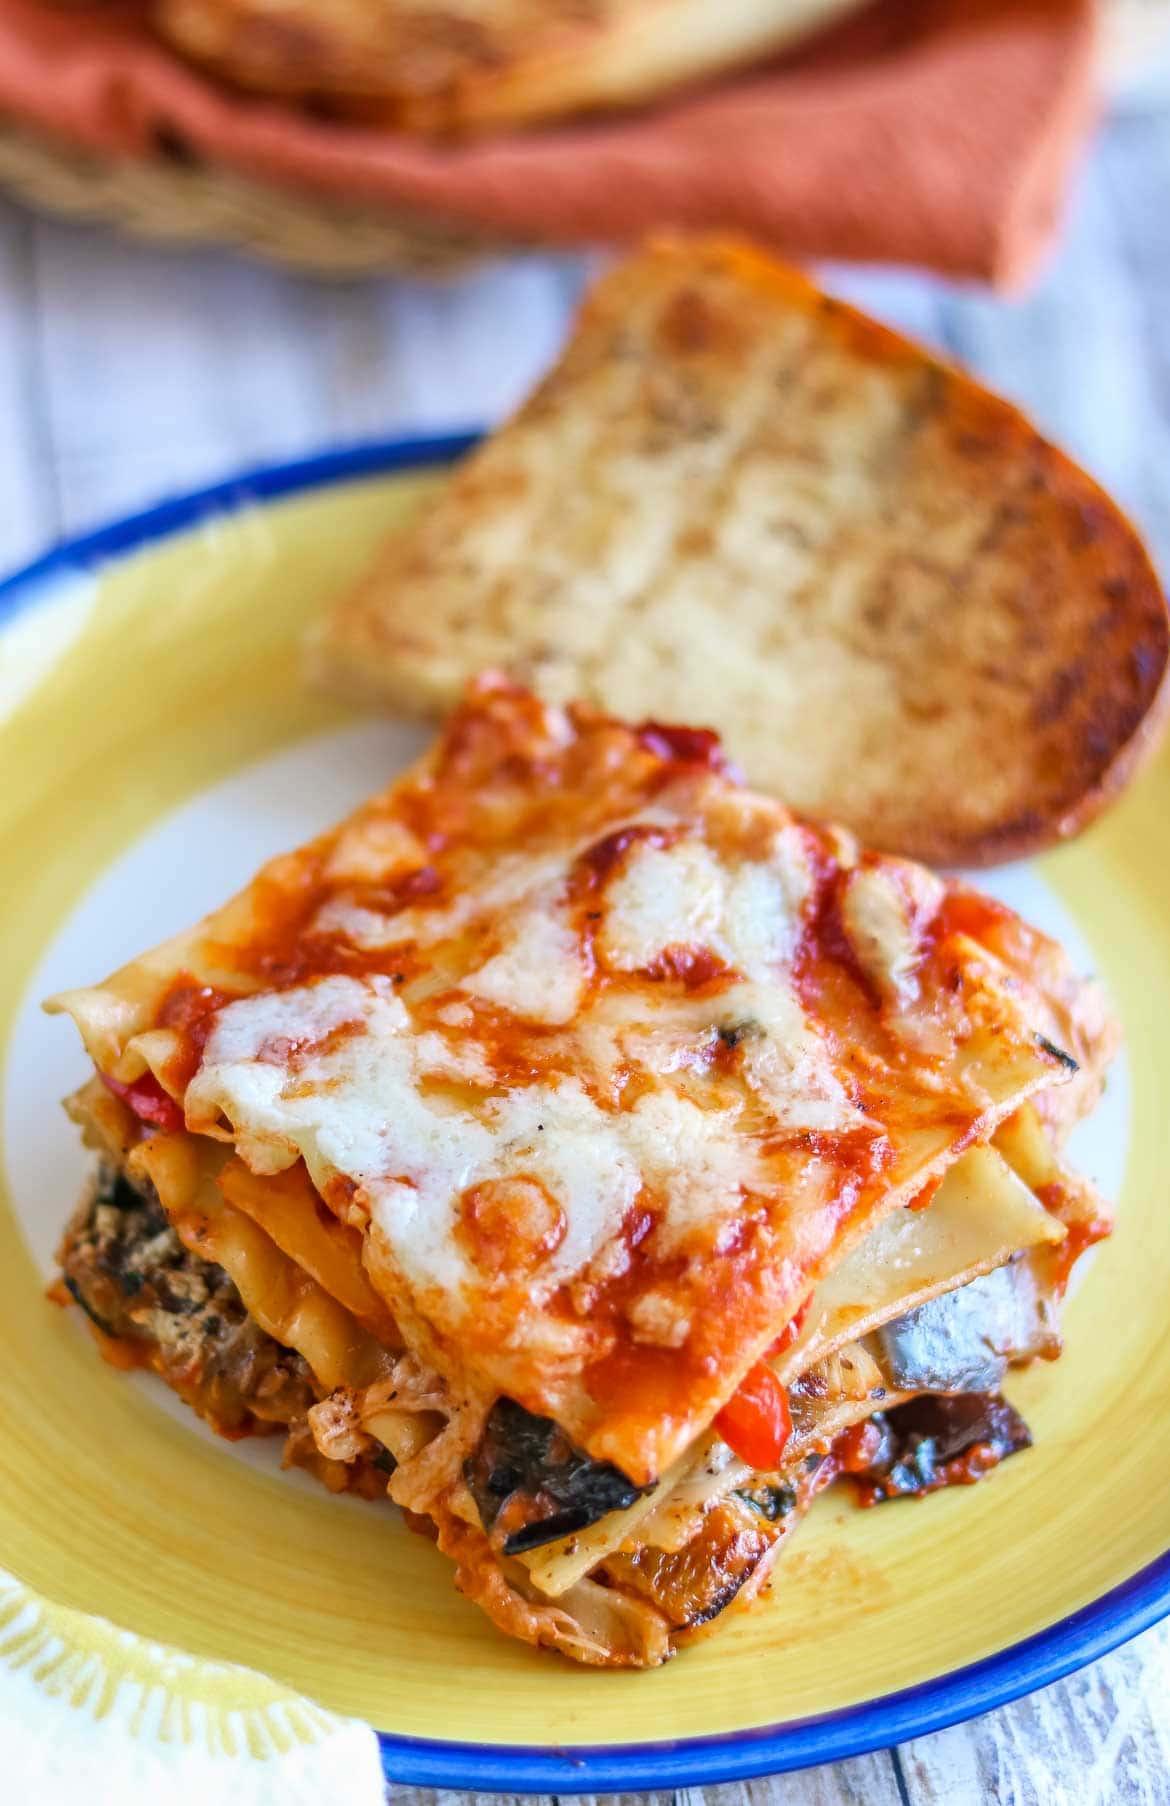 lasagna boil noodles recipe cook vegetarian roasted veggies bake recipes air fryer easy grilled fry company